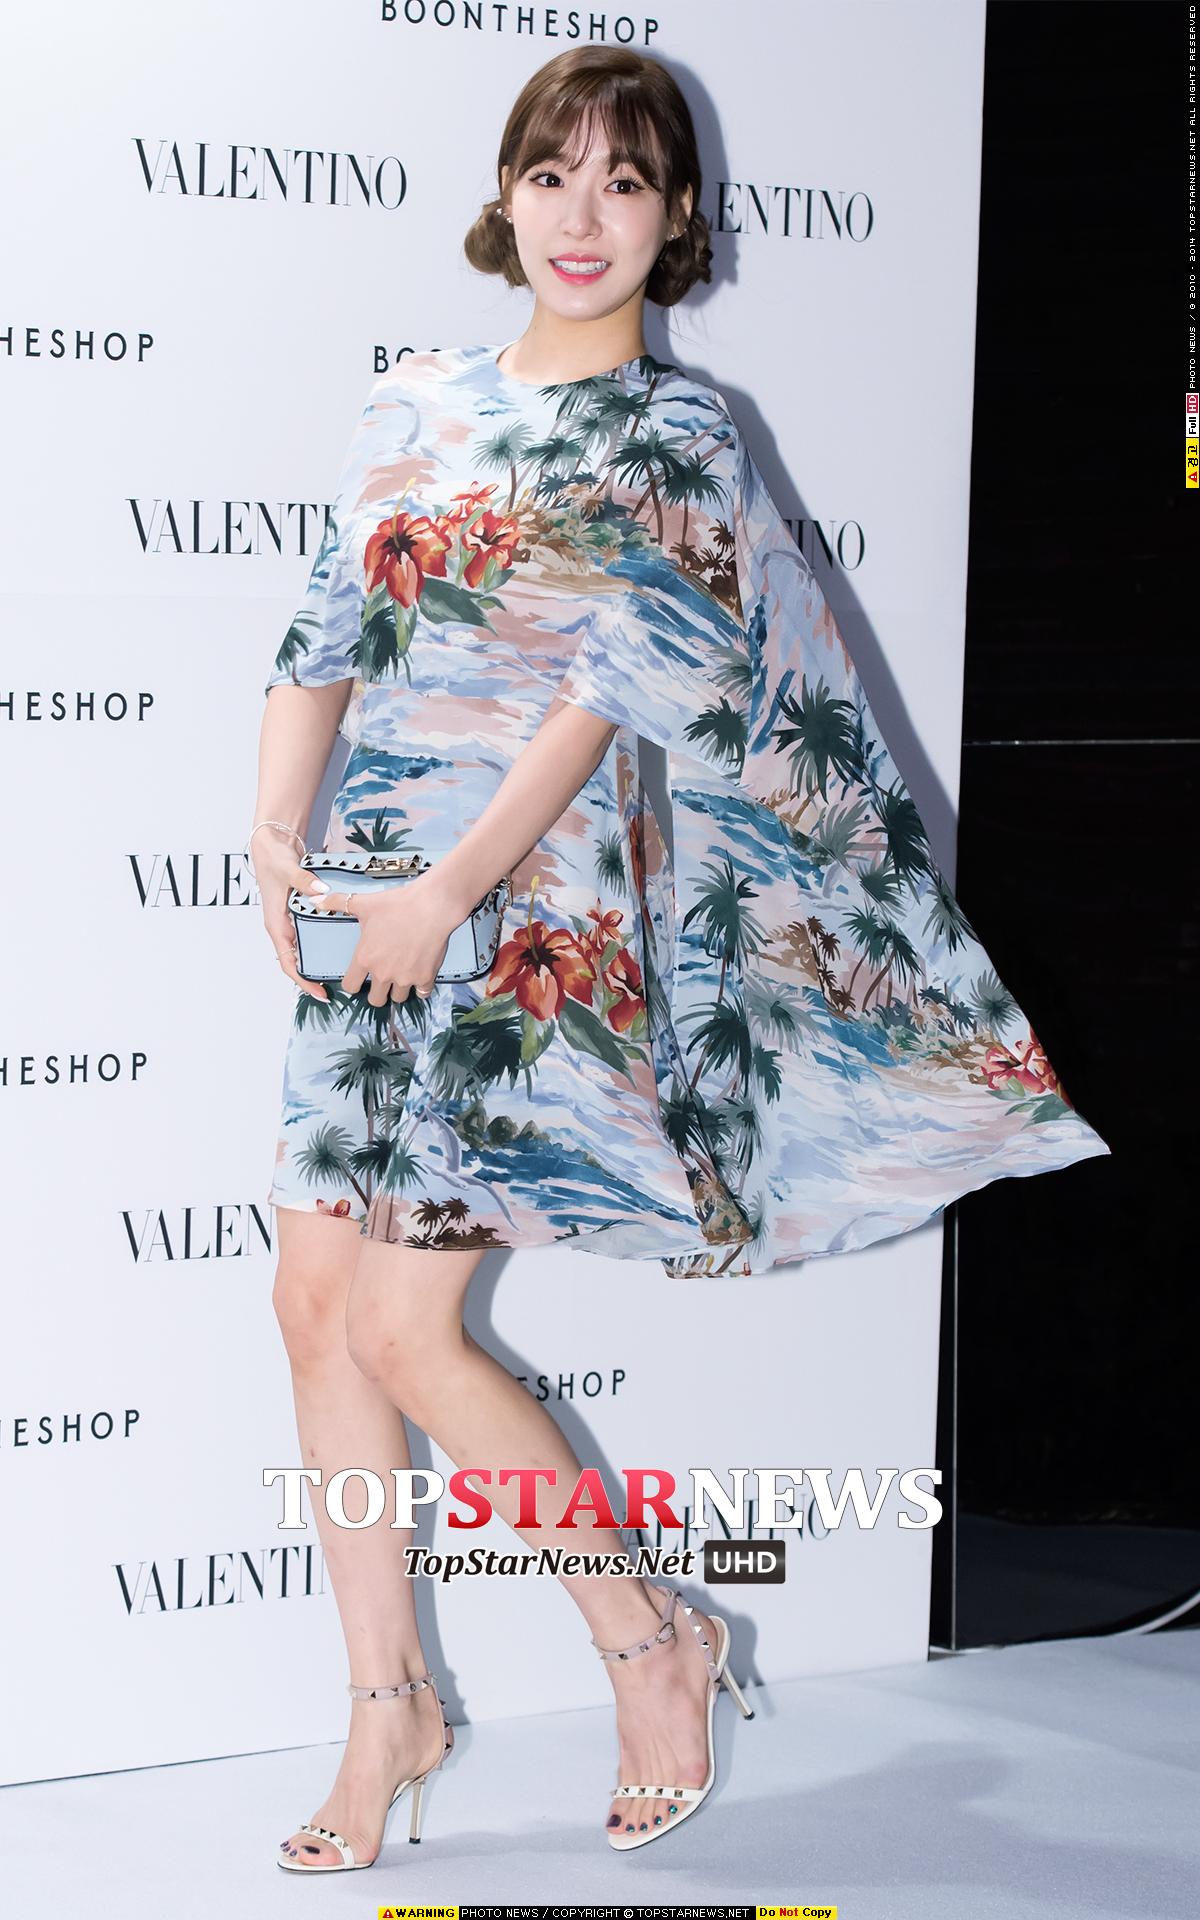 Tiffany參加活動時,以可愛的的髮型搭配充滿設計感的花卉設計,宛如俏麗的仙女下凡~